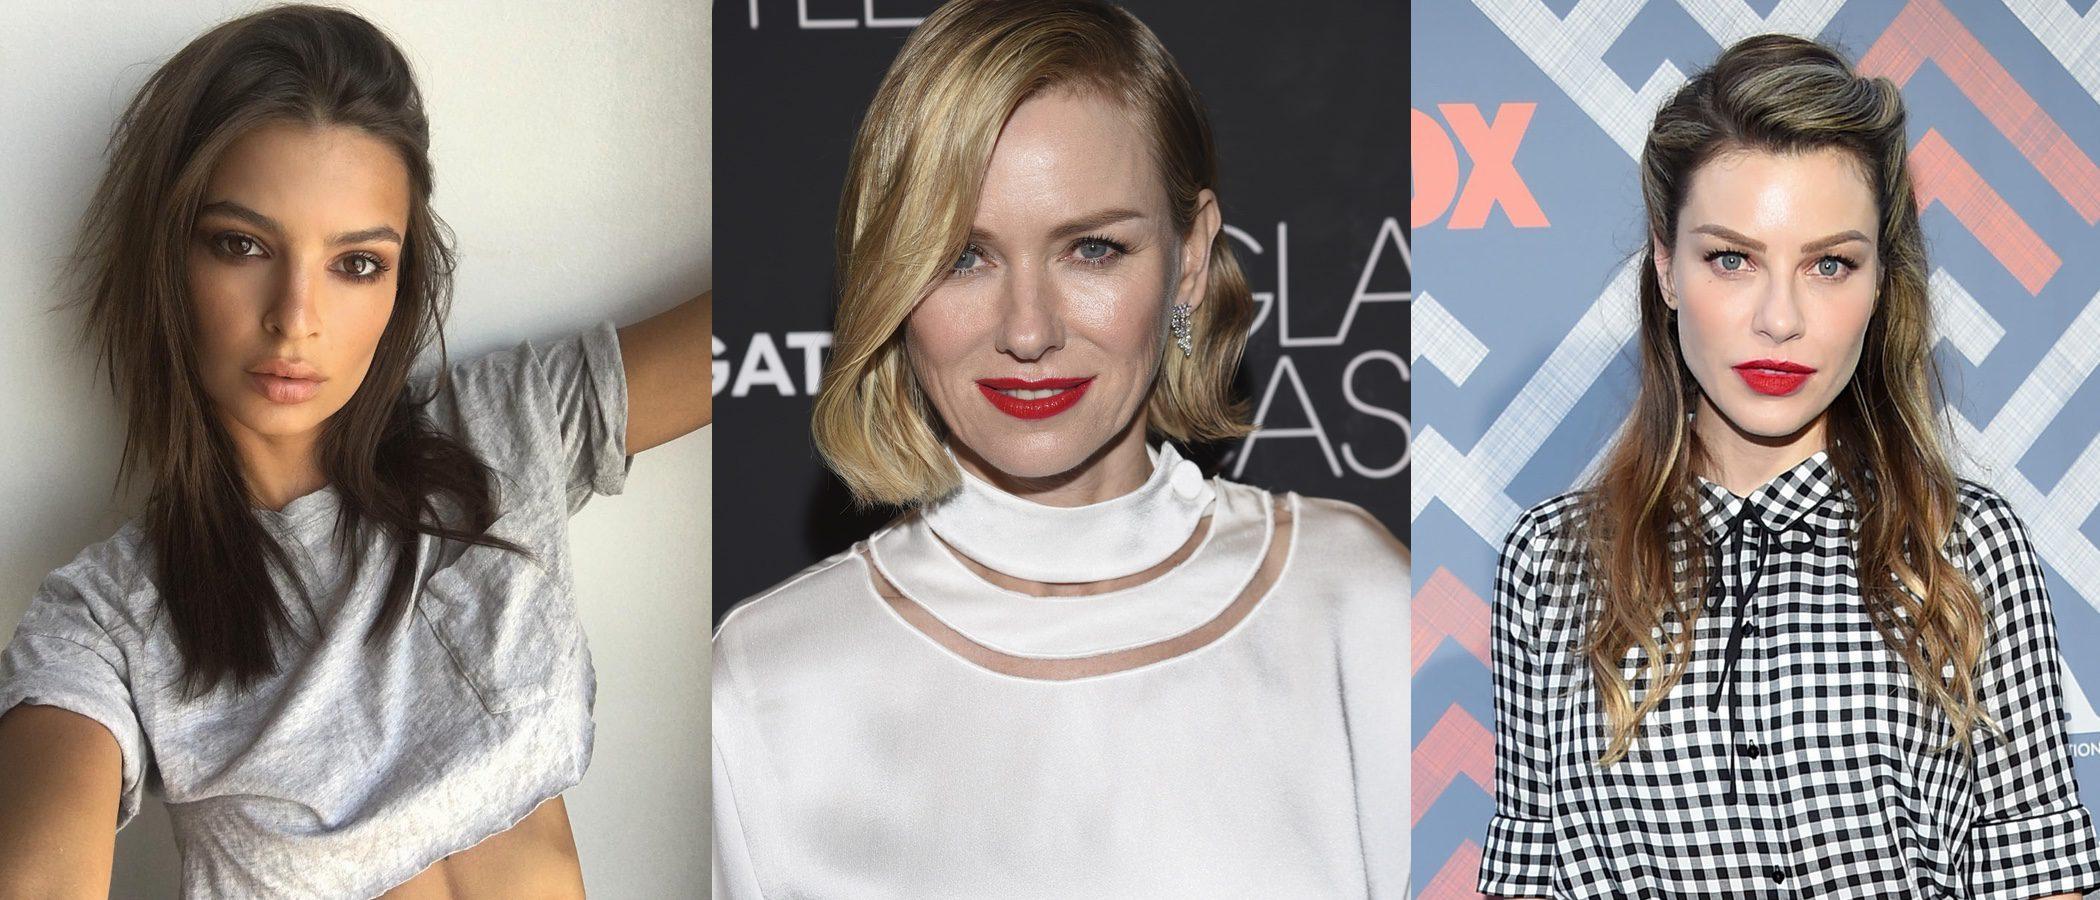 Emily Ratajkowski y Naomi Watts, entre los mejores beauty looks de la semana